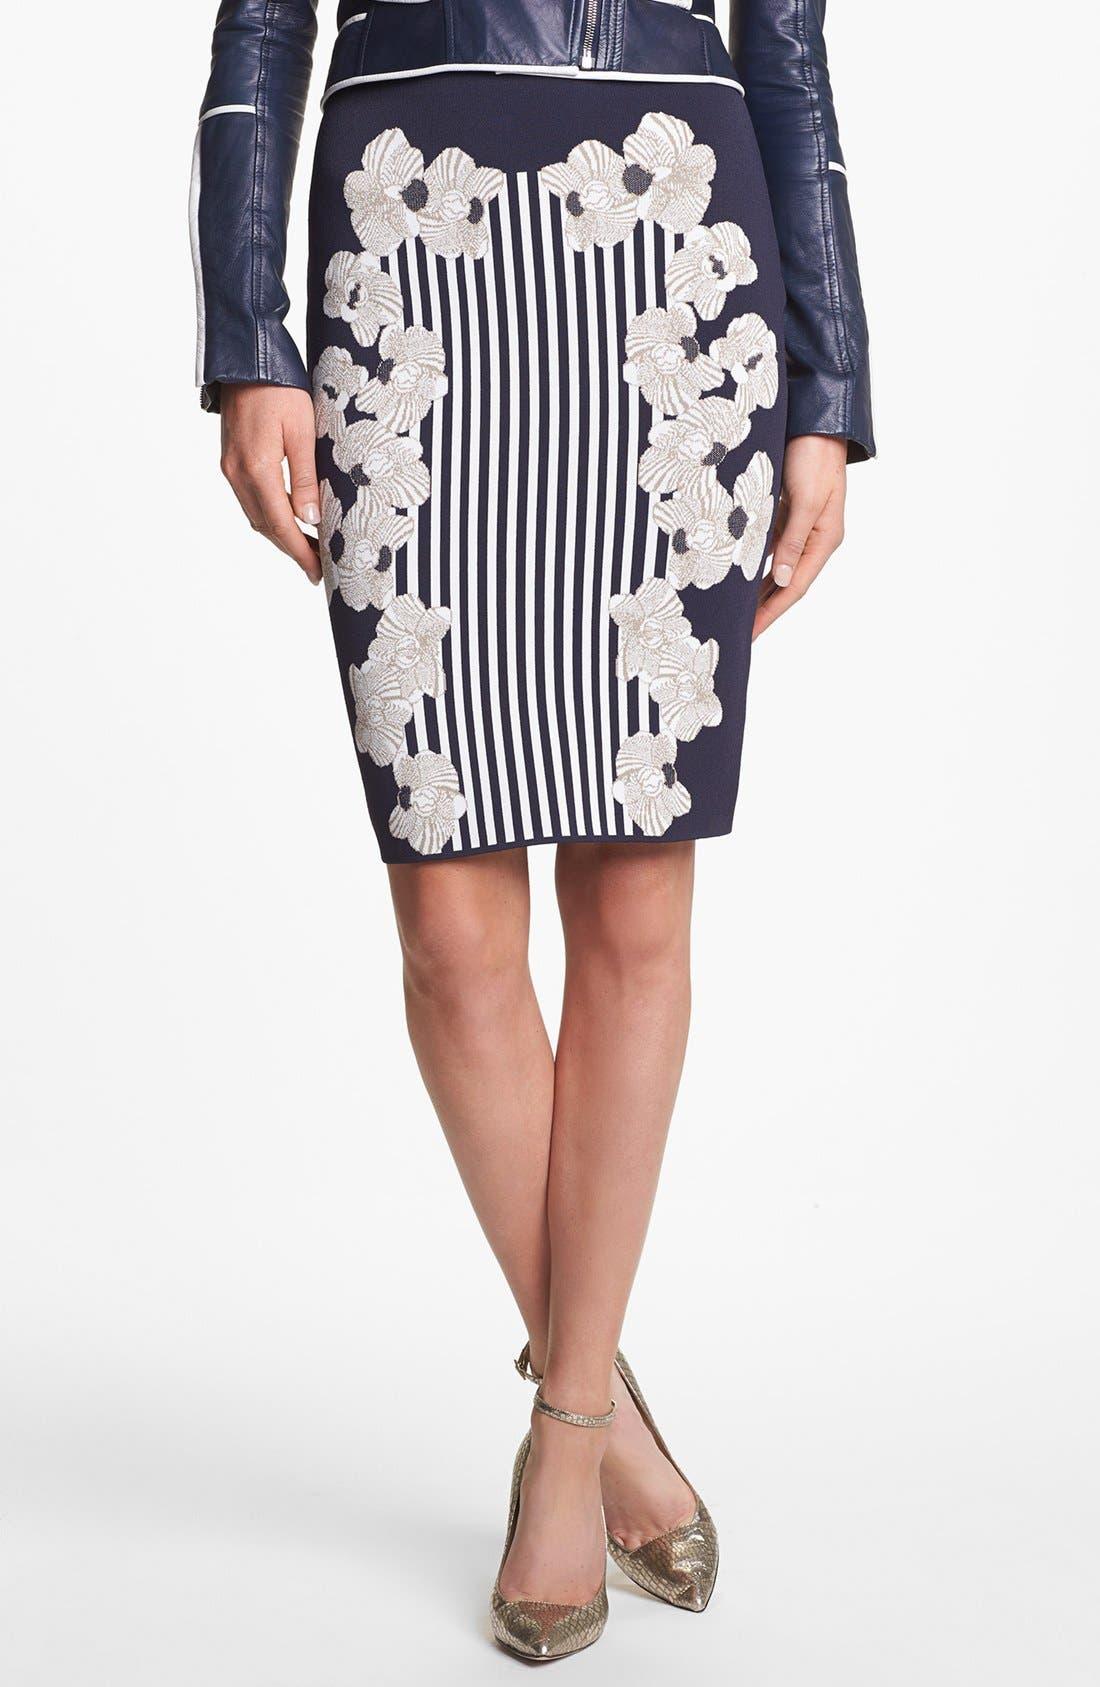 Alternate Image 1 Selected - Diane von Furstenberg 'Kacee' Print Twill Pencil Skirt